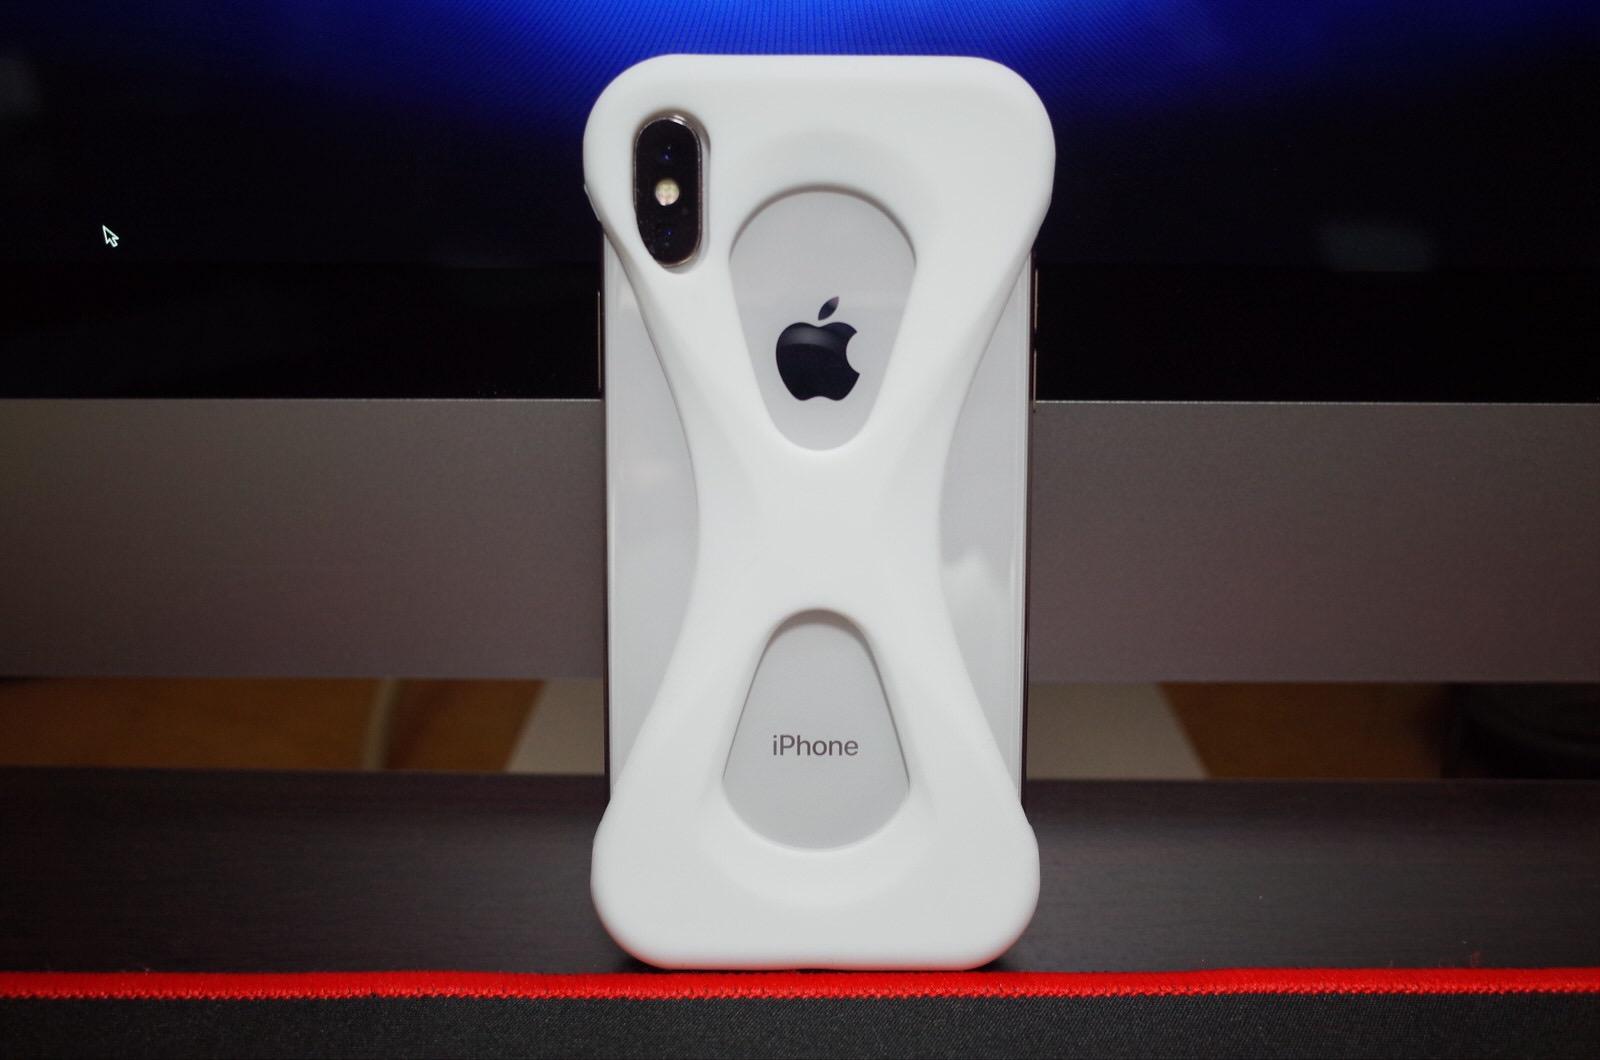 Palmo パルモ スマホケース iPhone XS/X 対応 ホワイト 白−10